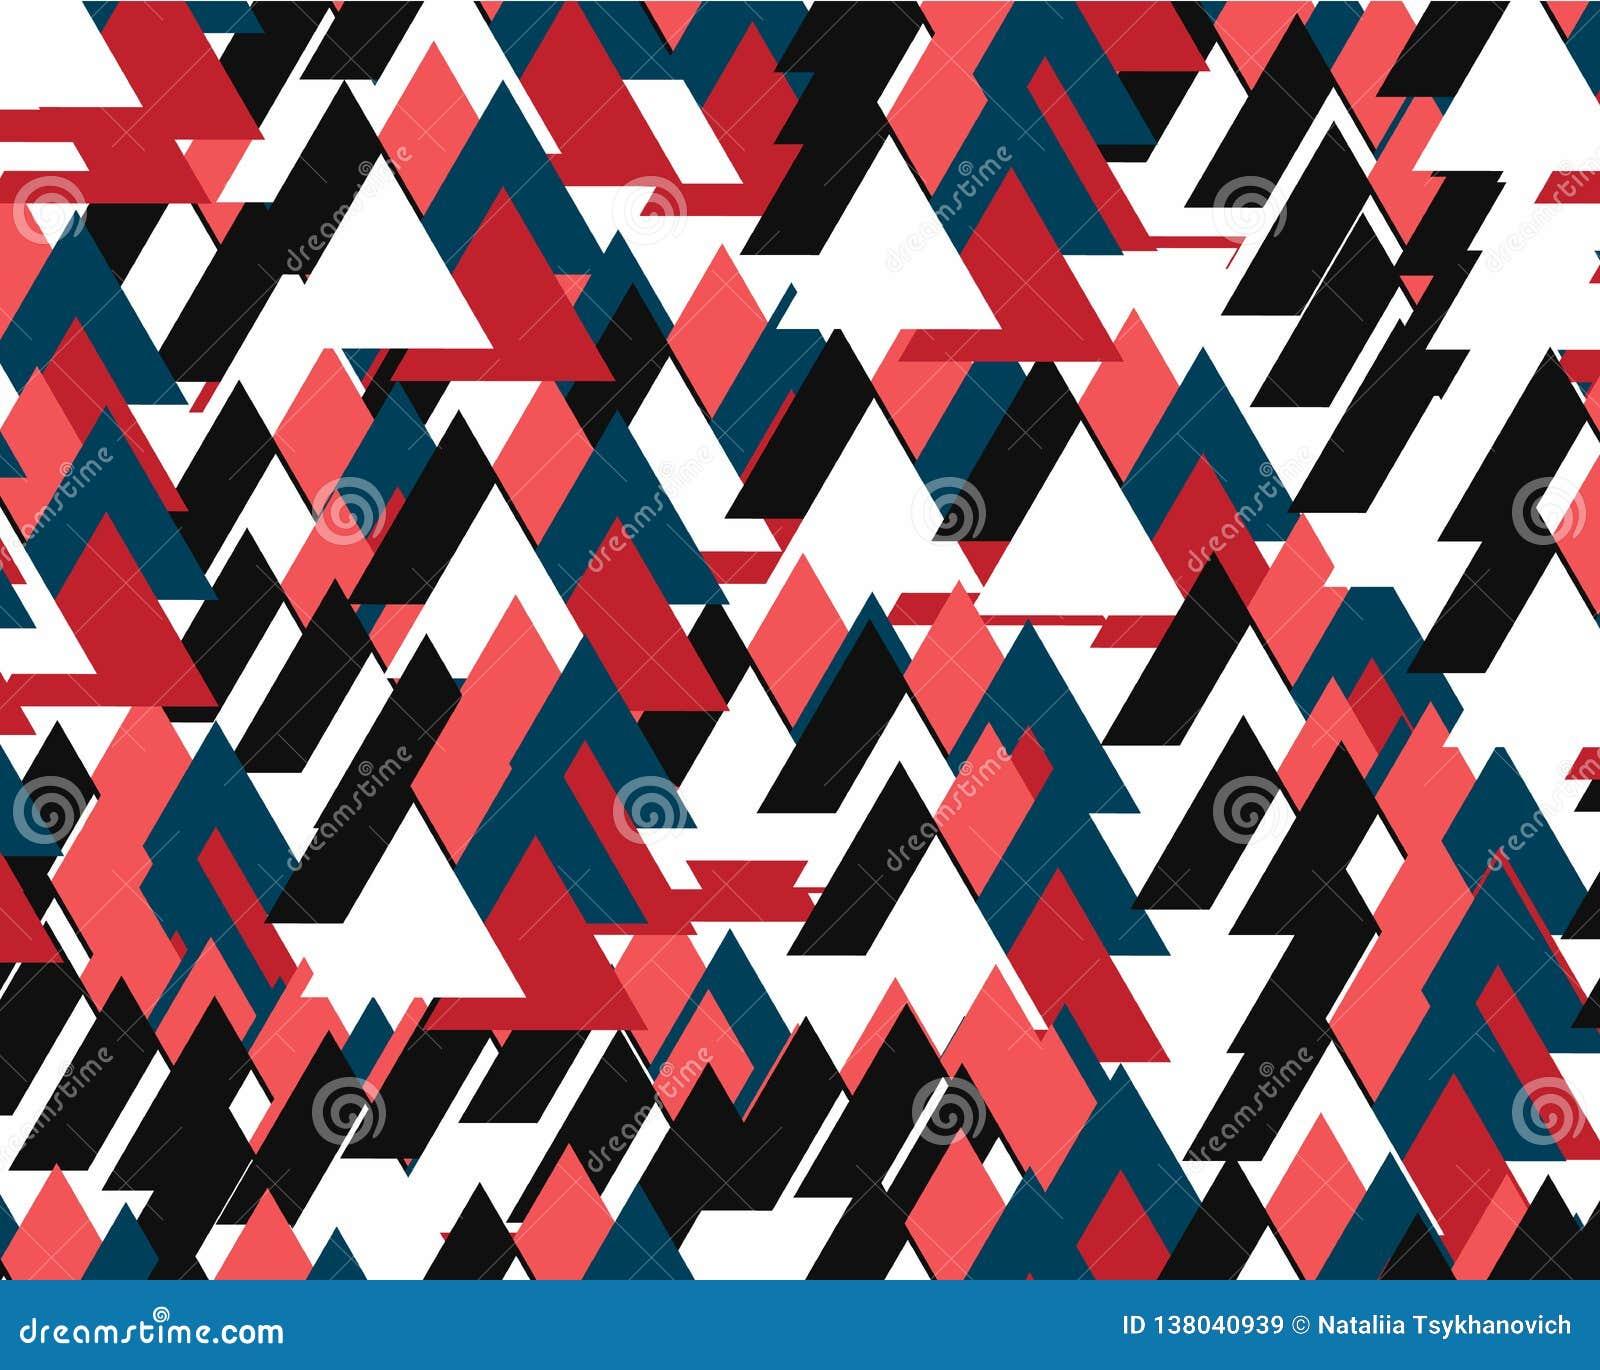 Abstracte achtergrond die uit vele gekleurde driehoeken bestaan